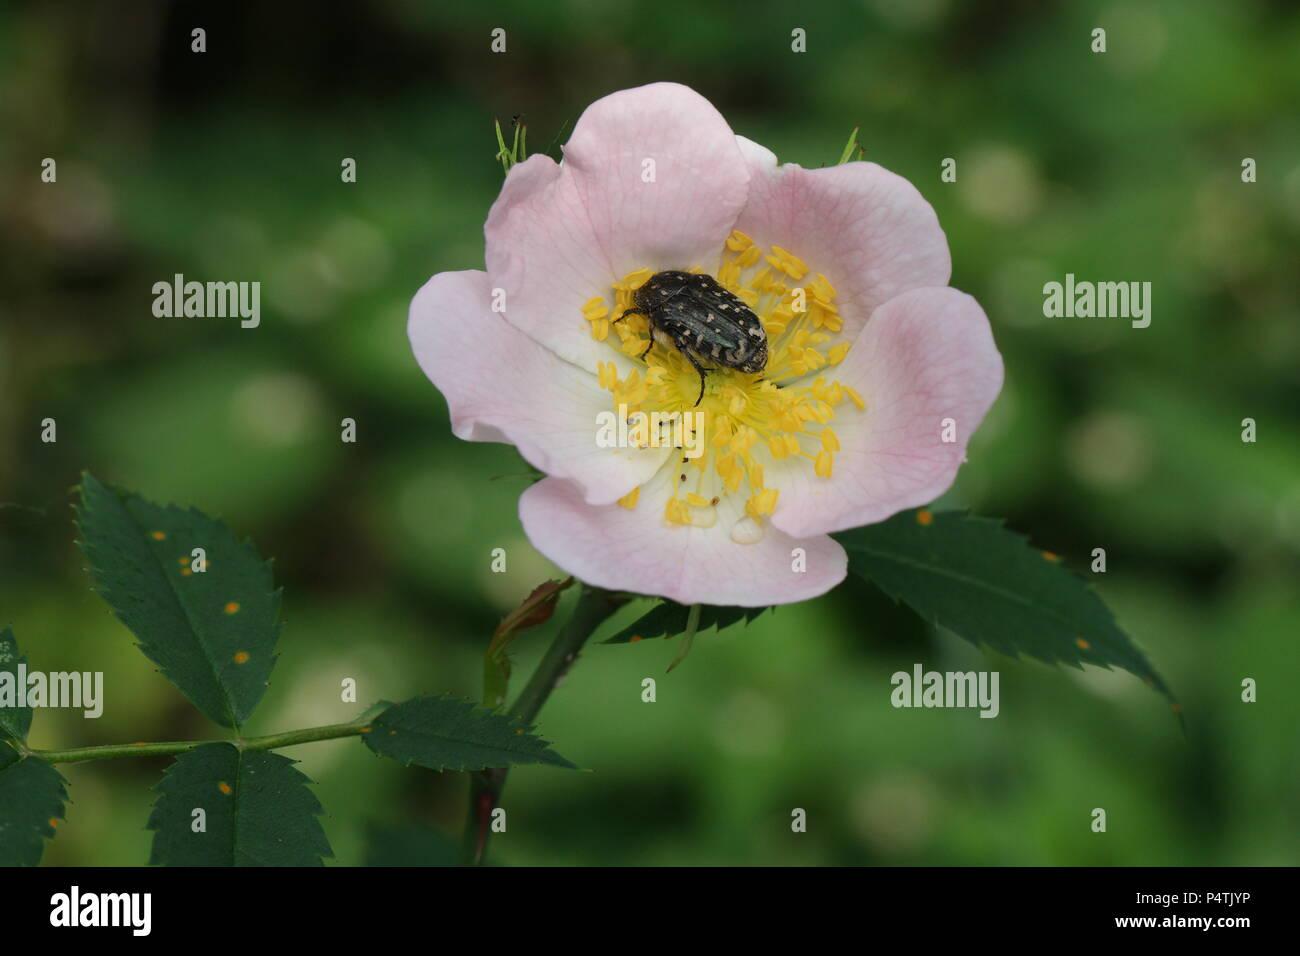 Rosa canina (Dog Rose / Hunds-Rose, Hundsrose, Heckenrose) & Tropinota hirta (Rose Beetle / Zottiger Rosenkäfer) - Stock Image